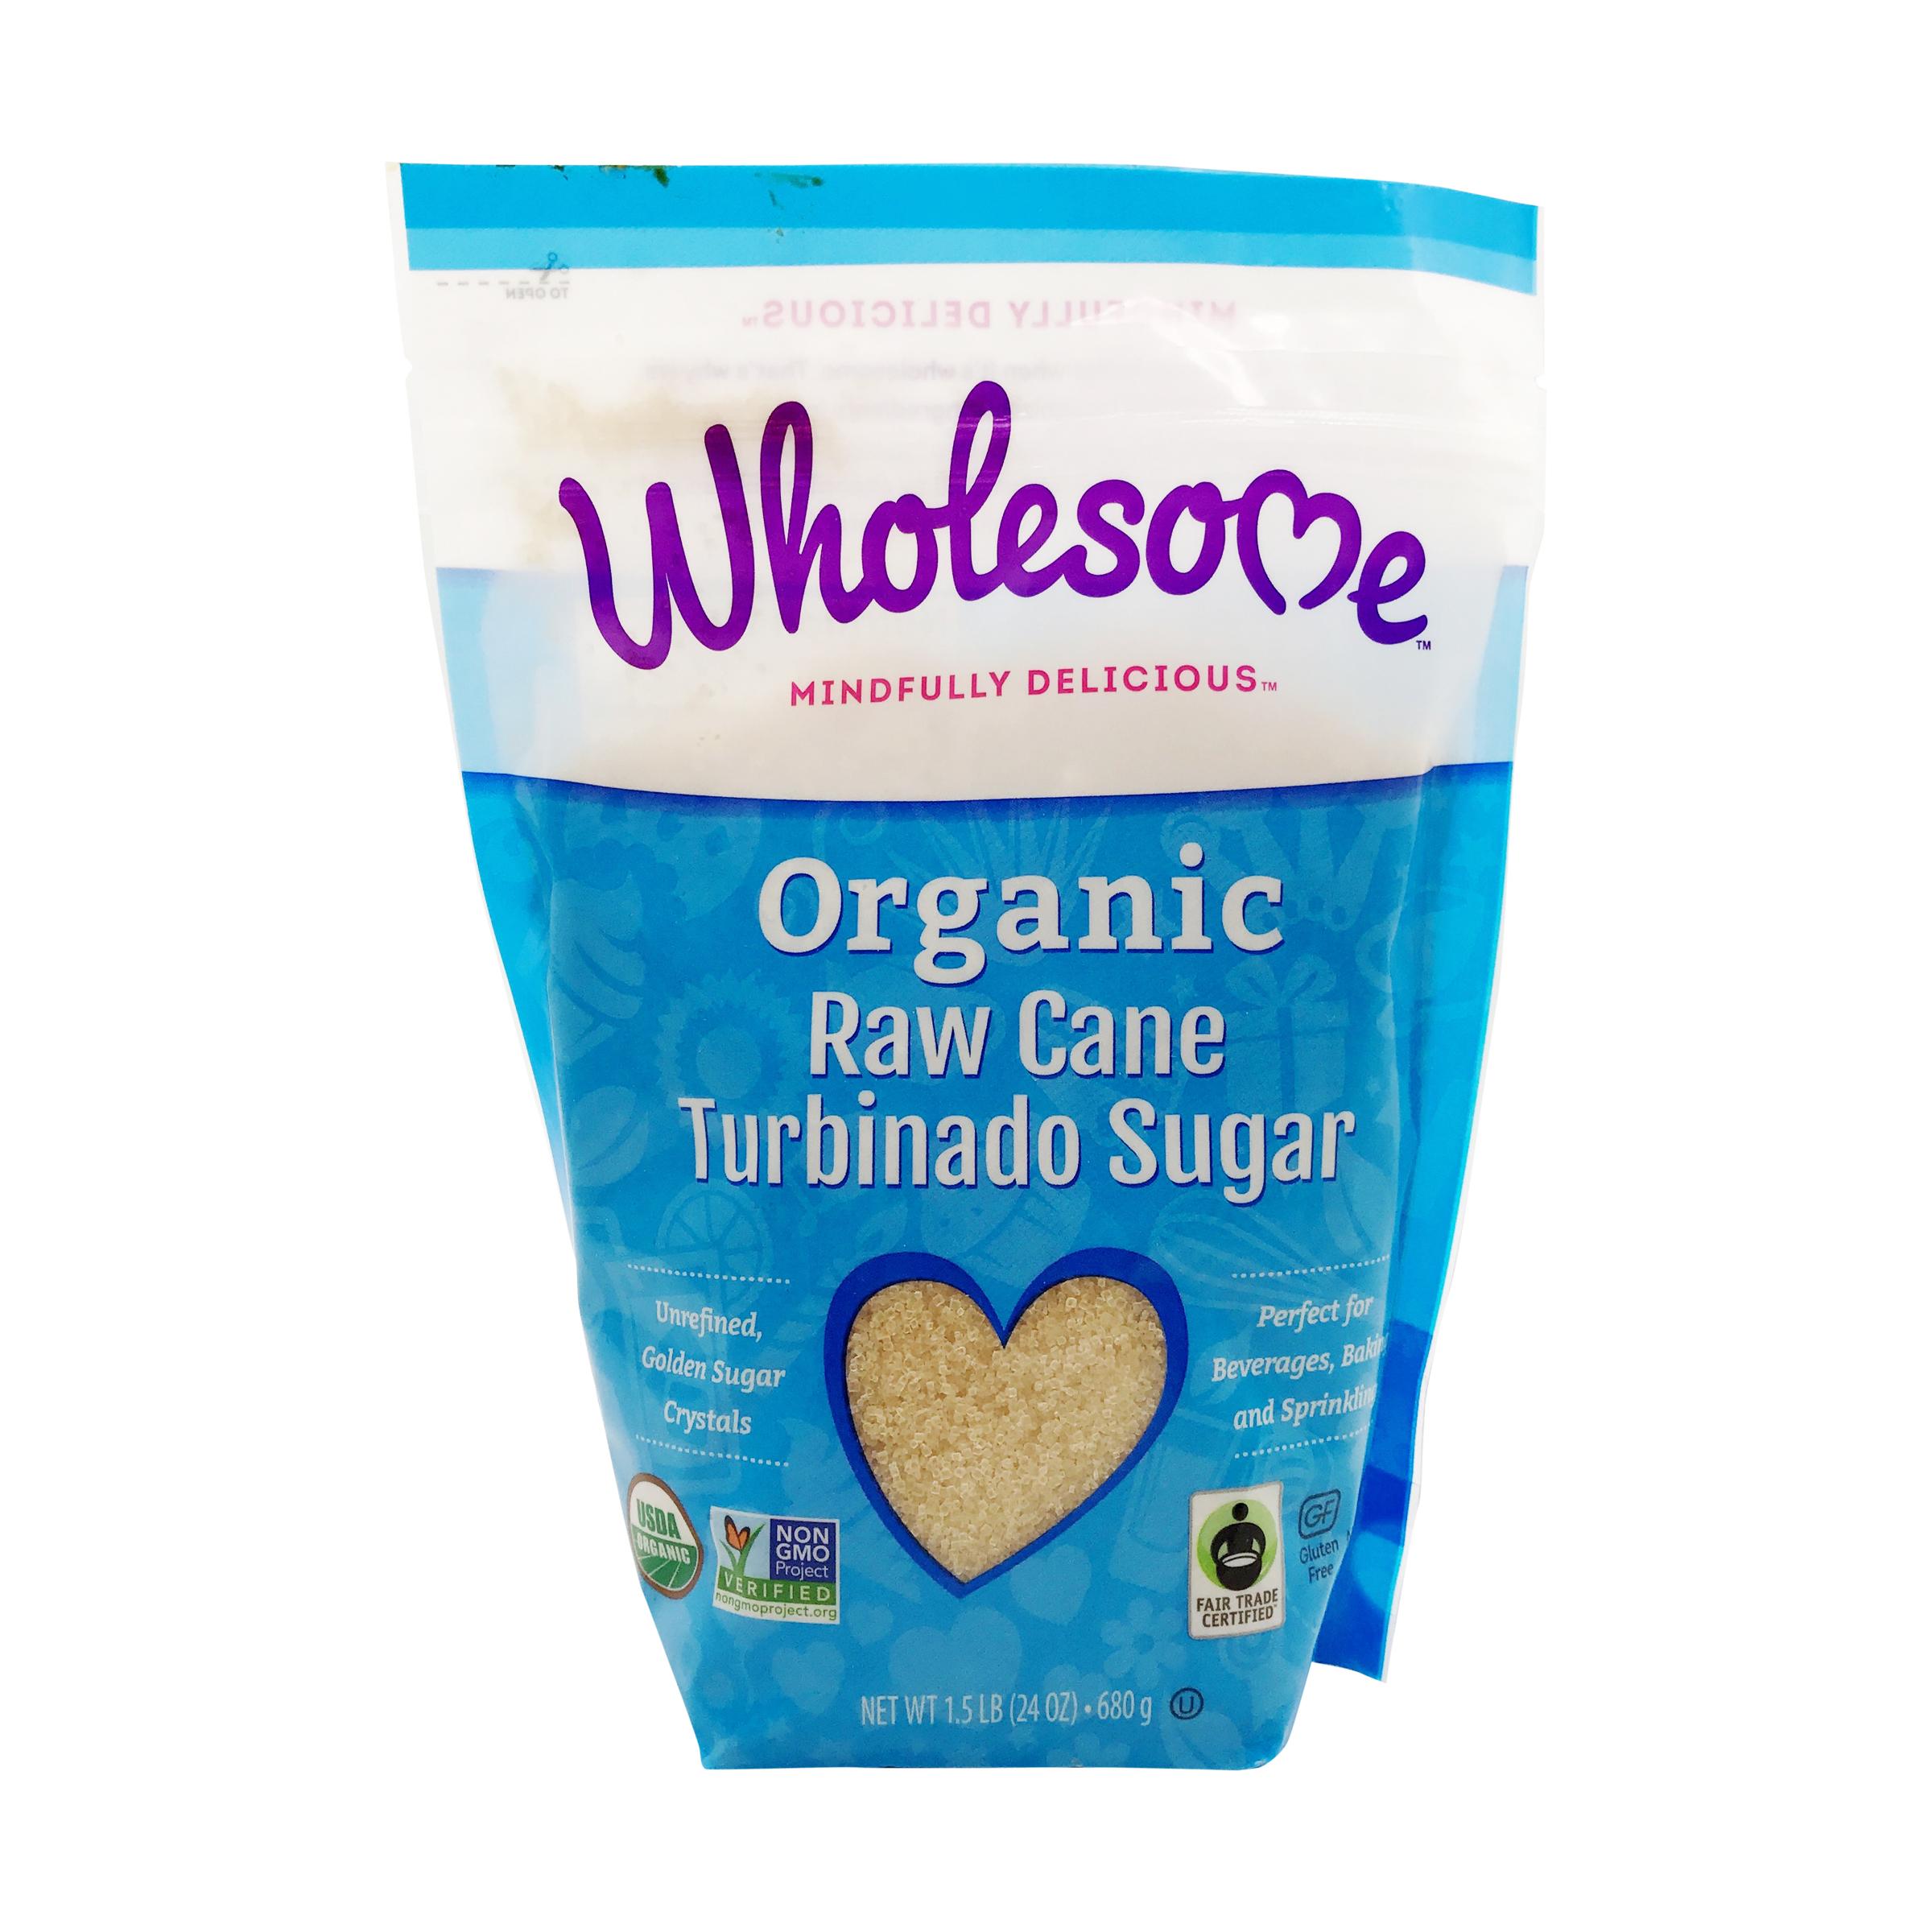 Organic Turbinado Raw Cane Sugar, 24 oz